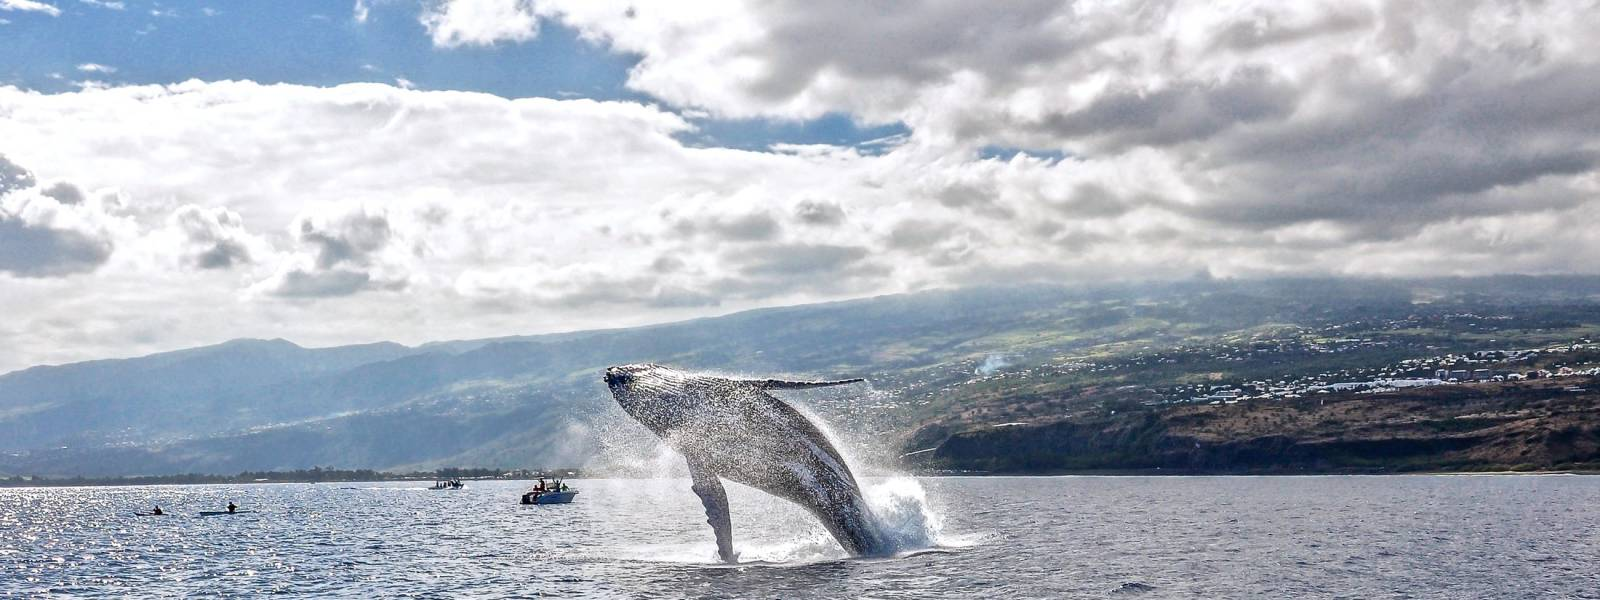 Whales and Dolphins Cap La Houssaye